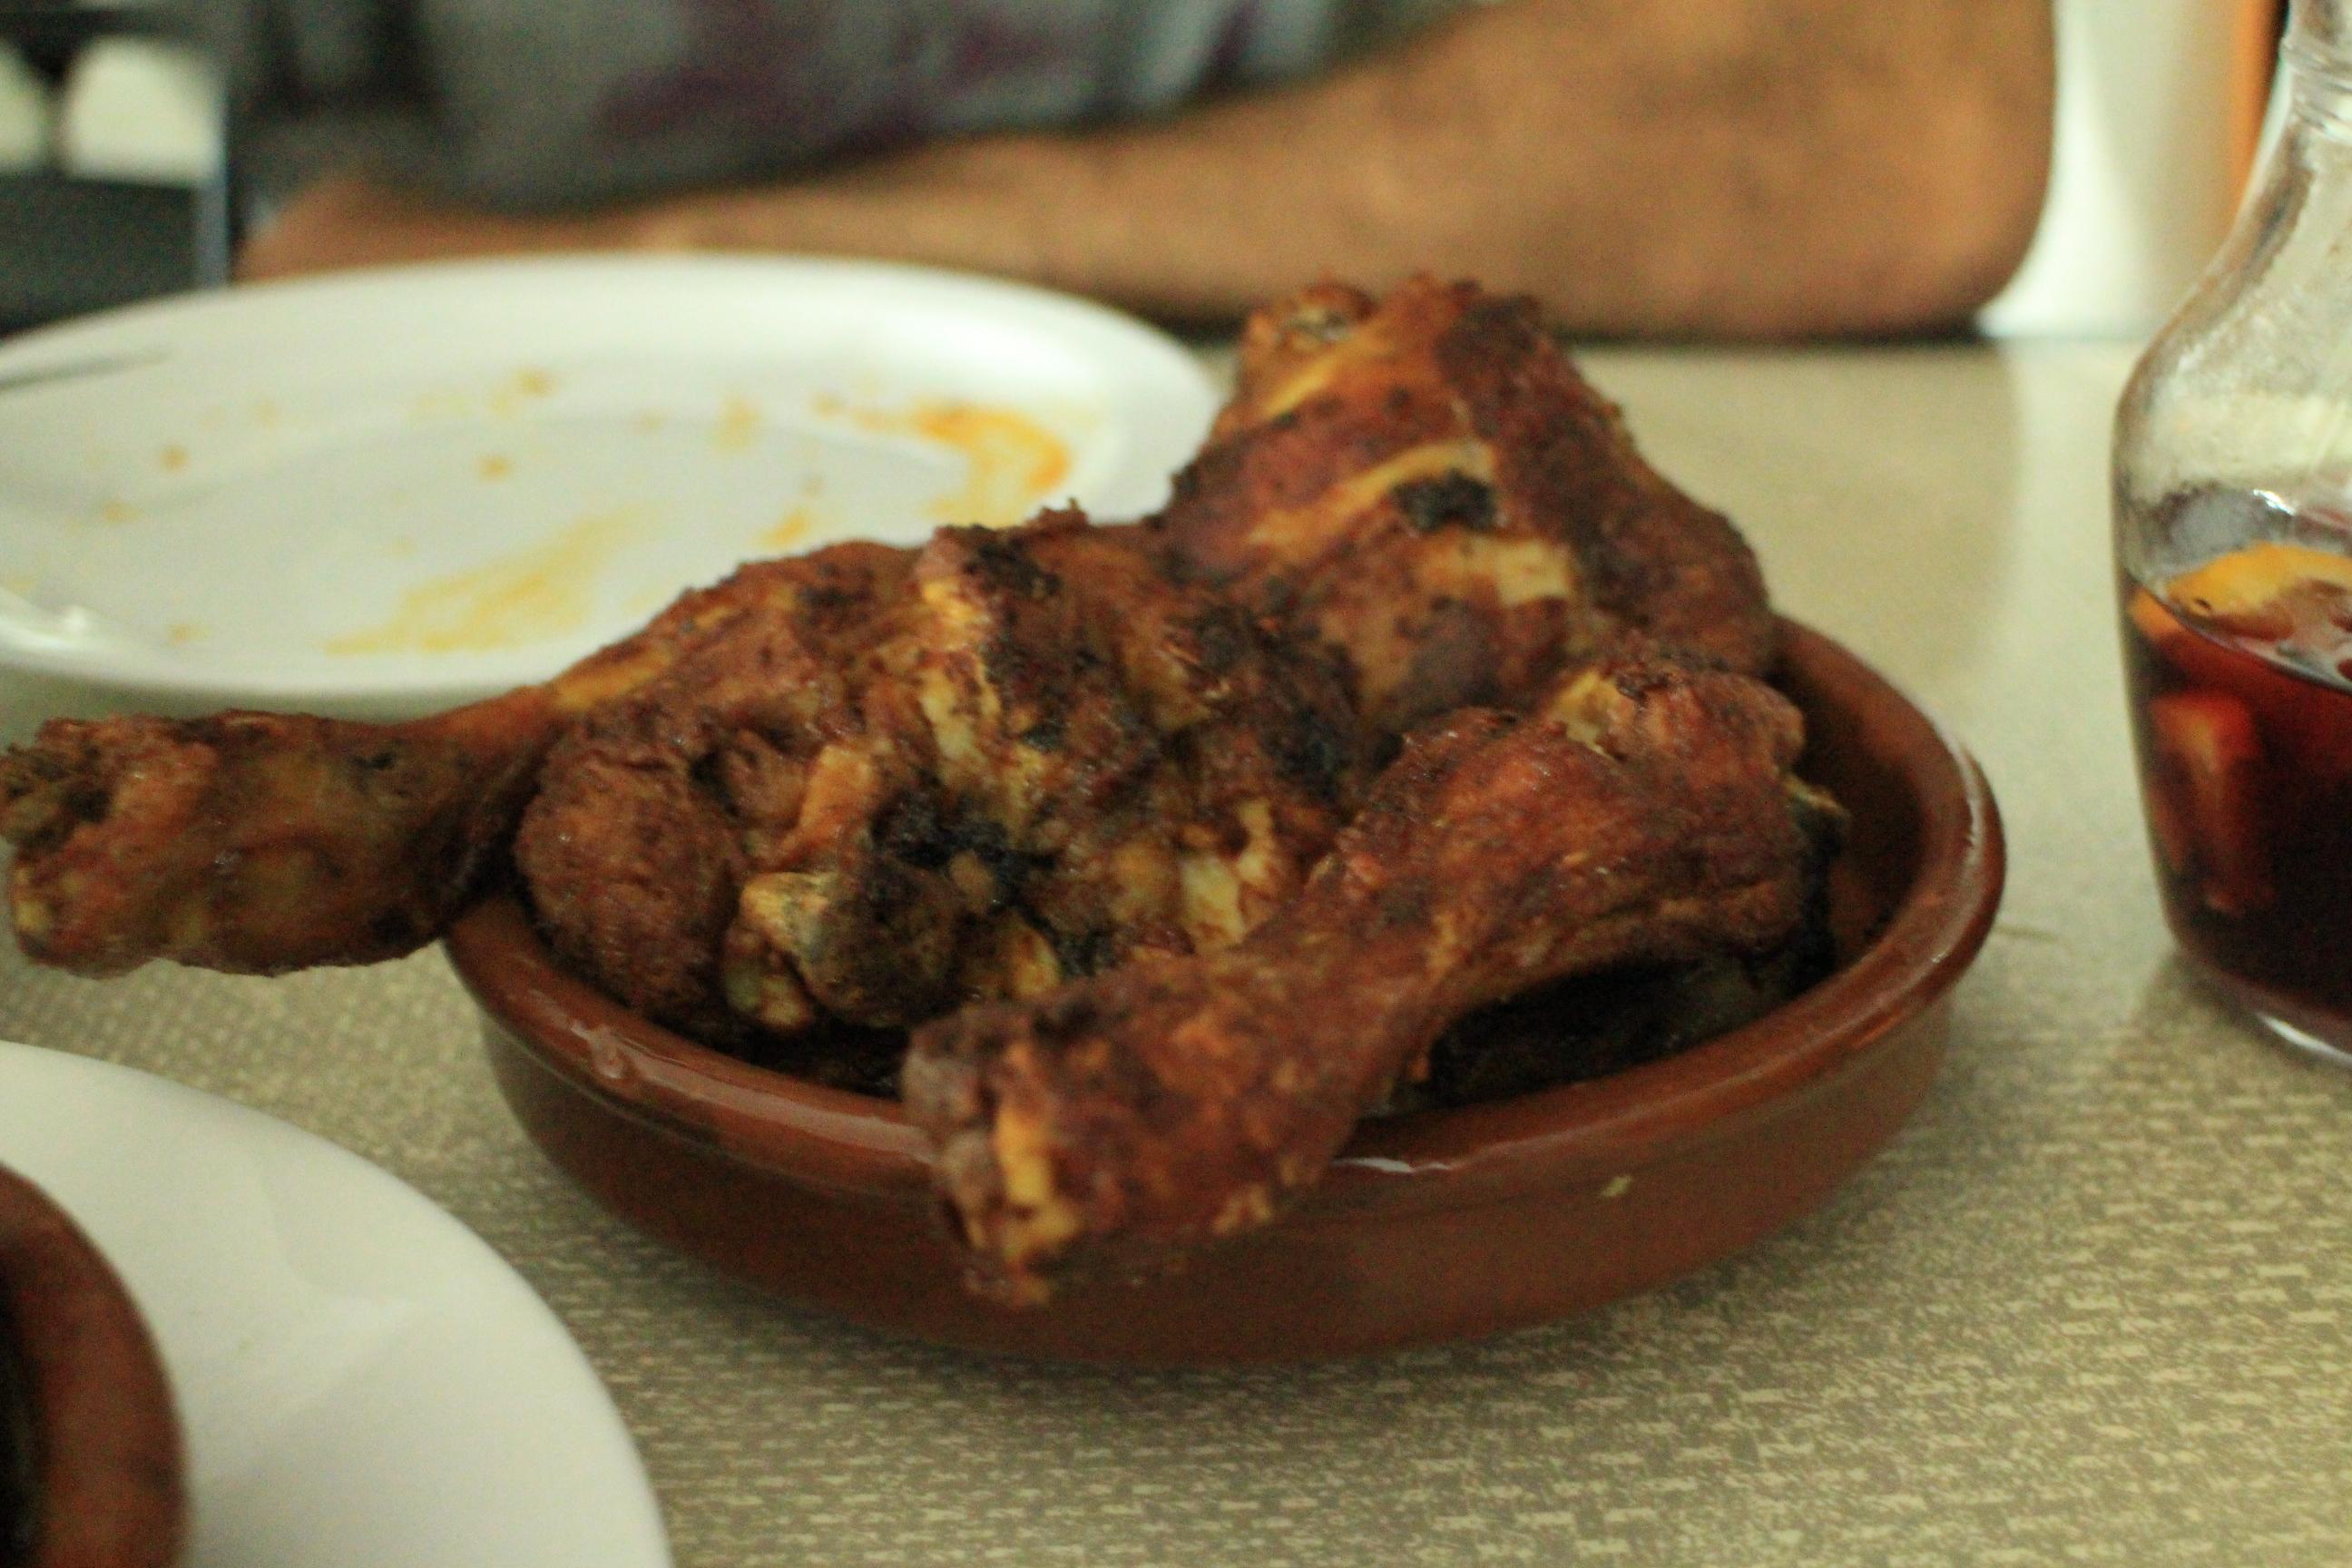 來Tenerife沒吃過Otelo的蒜香炸雞(Pollo al ajillo)不算來過!